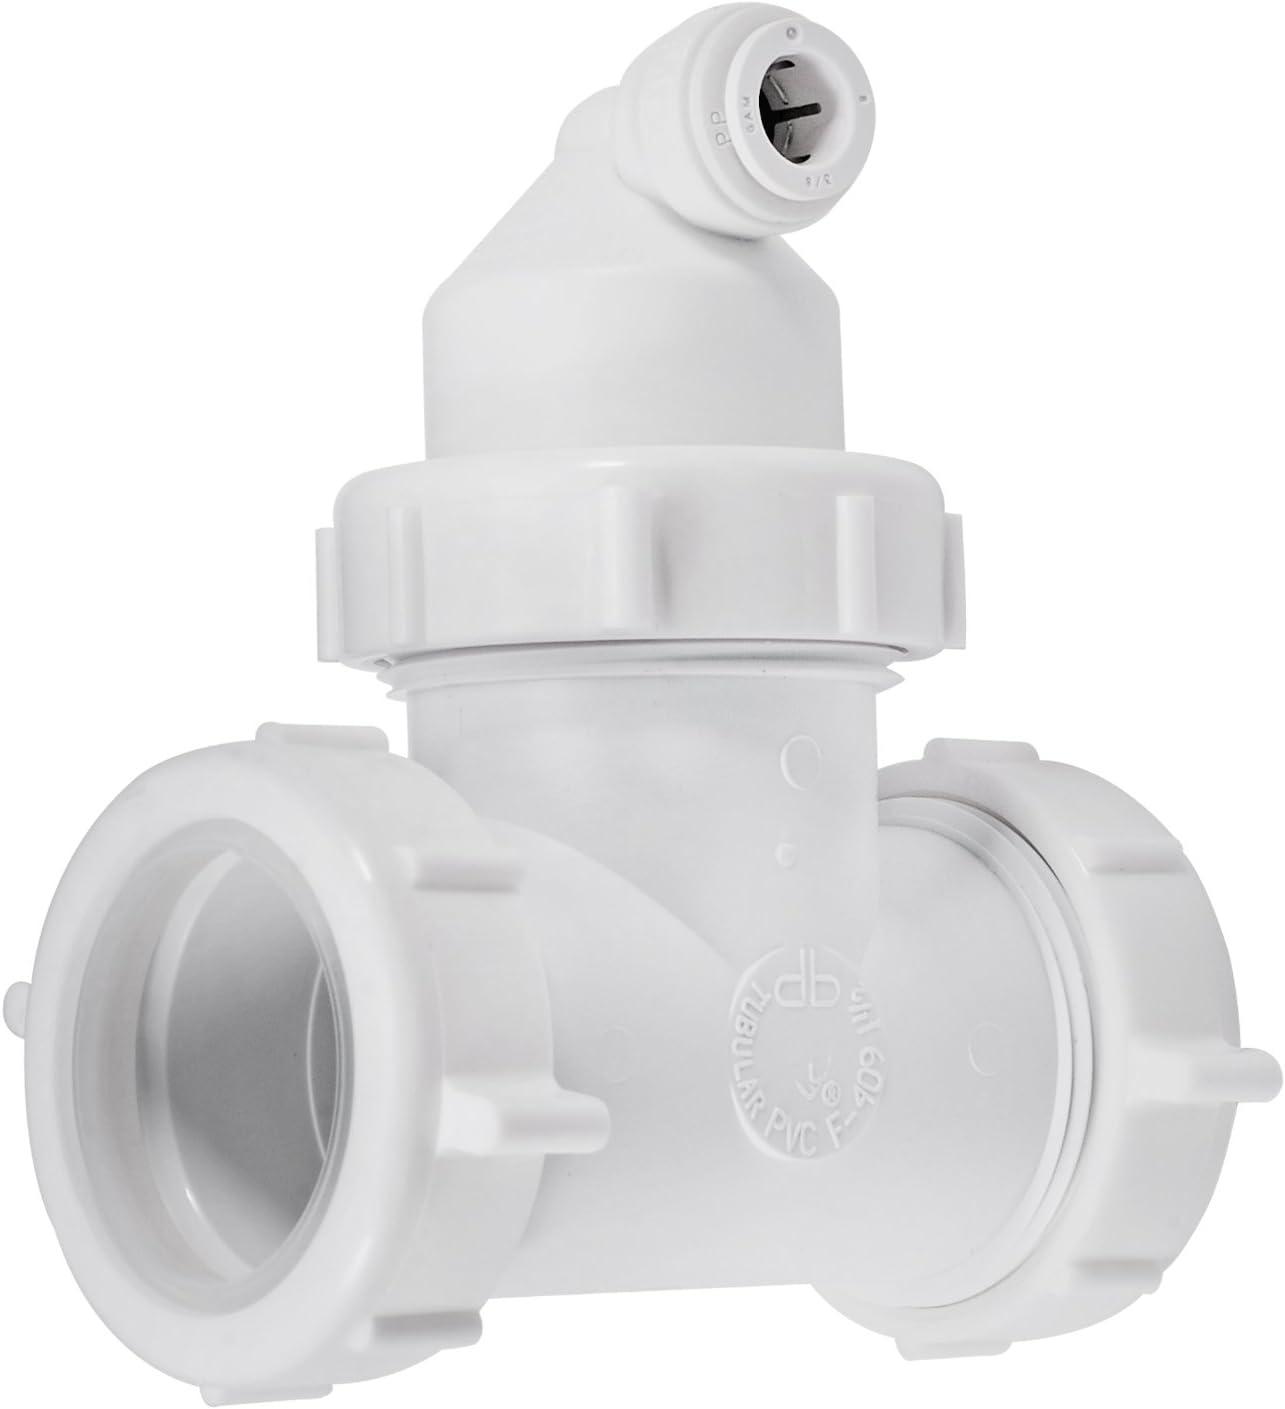 Watts Premier 164014 DLA-12 Drain Line Plumbing Adapter